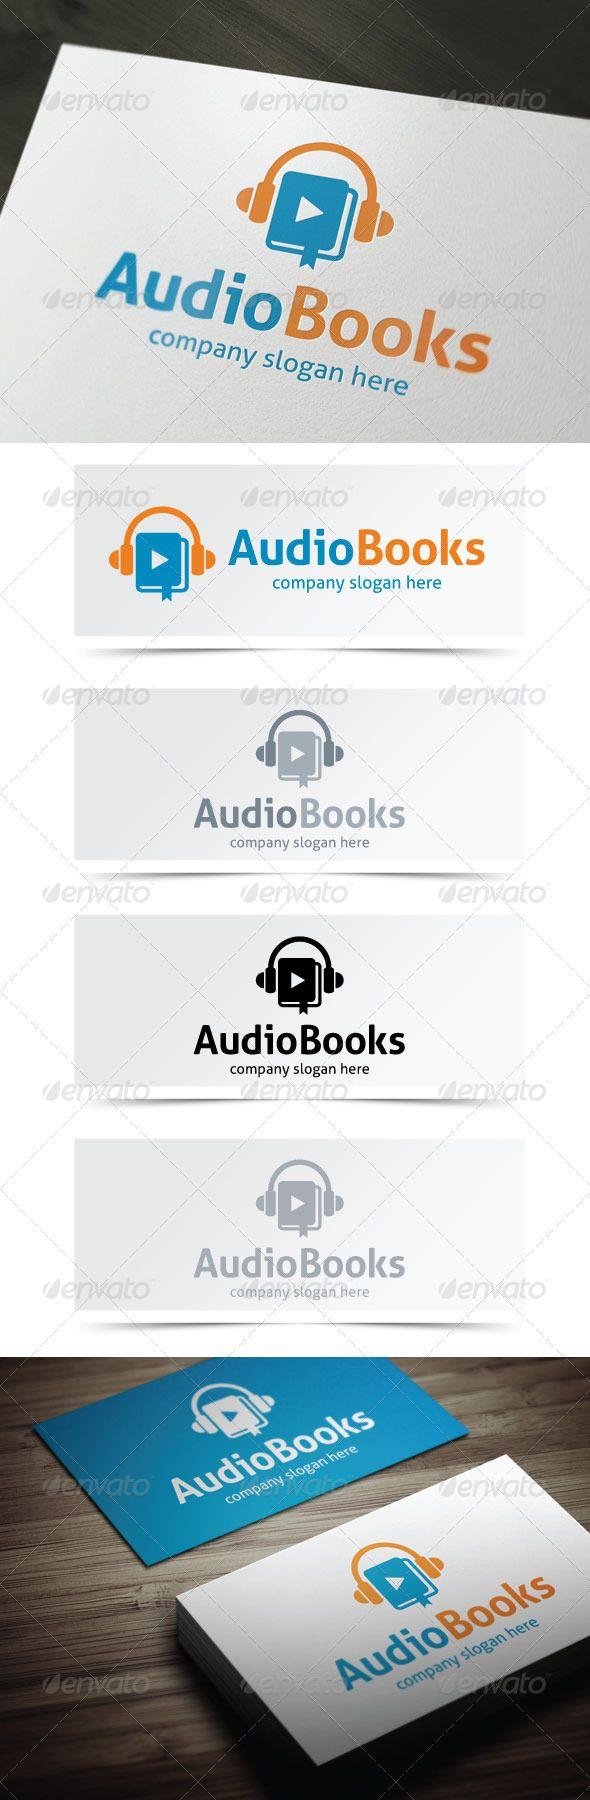 Audio Books - Logo Design Template Vector #logotype Download it here: http://graphicriver.net/item/audio-books/5171775?s_rank=316?ref=nexion